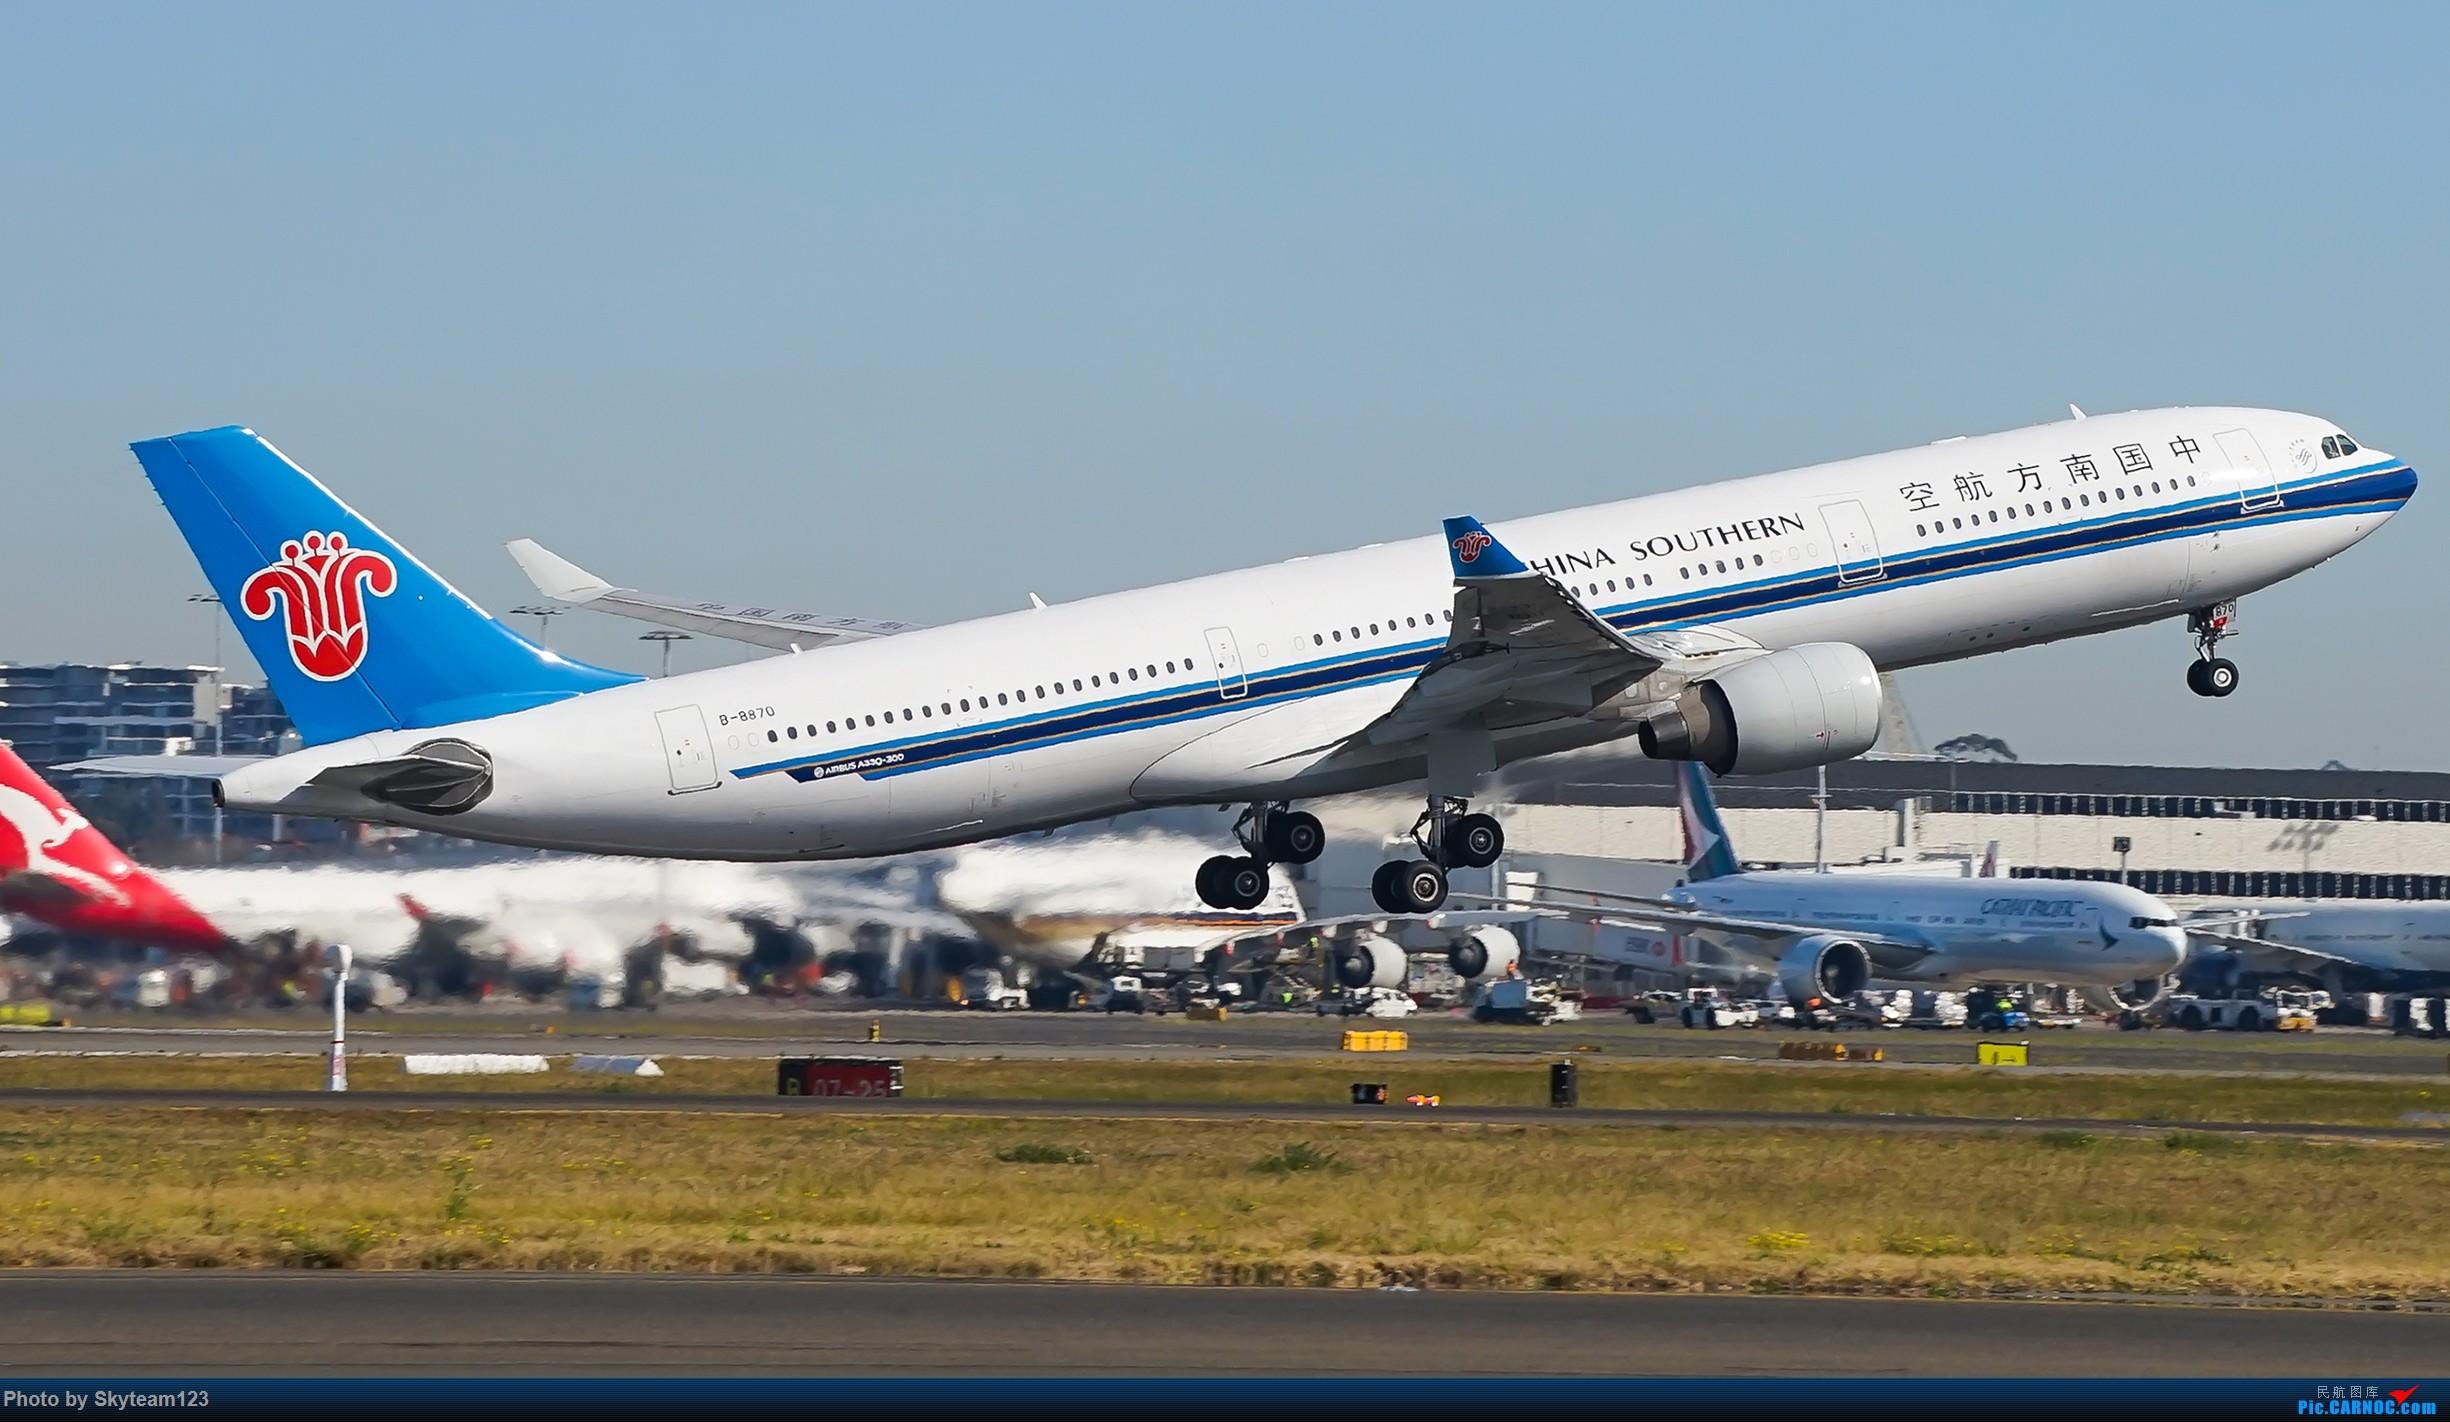 Re:[原创][SYD] 再访Blu EMU停车场 早上34L抵港出发杂图几张 AIRBUS A330-300 B-8870 澳大利亚悉尼金斯福德·史密斯机场